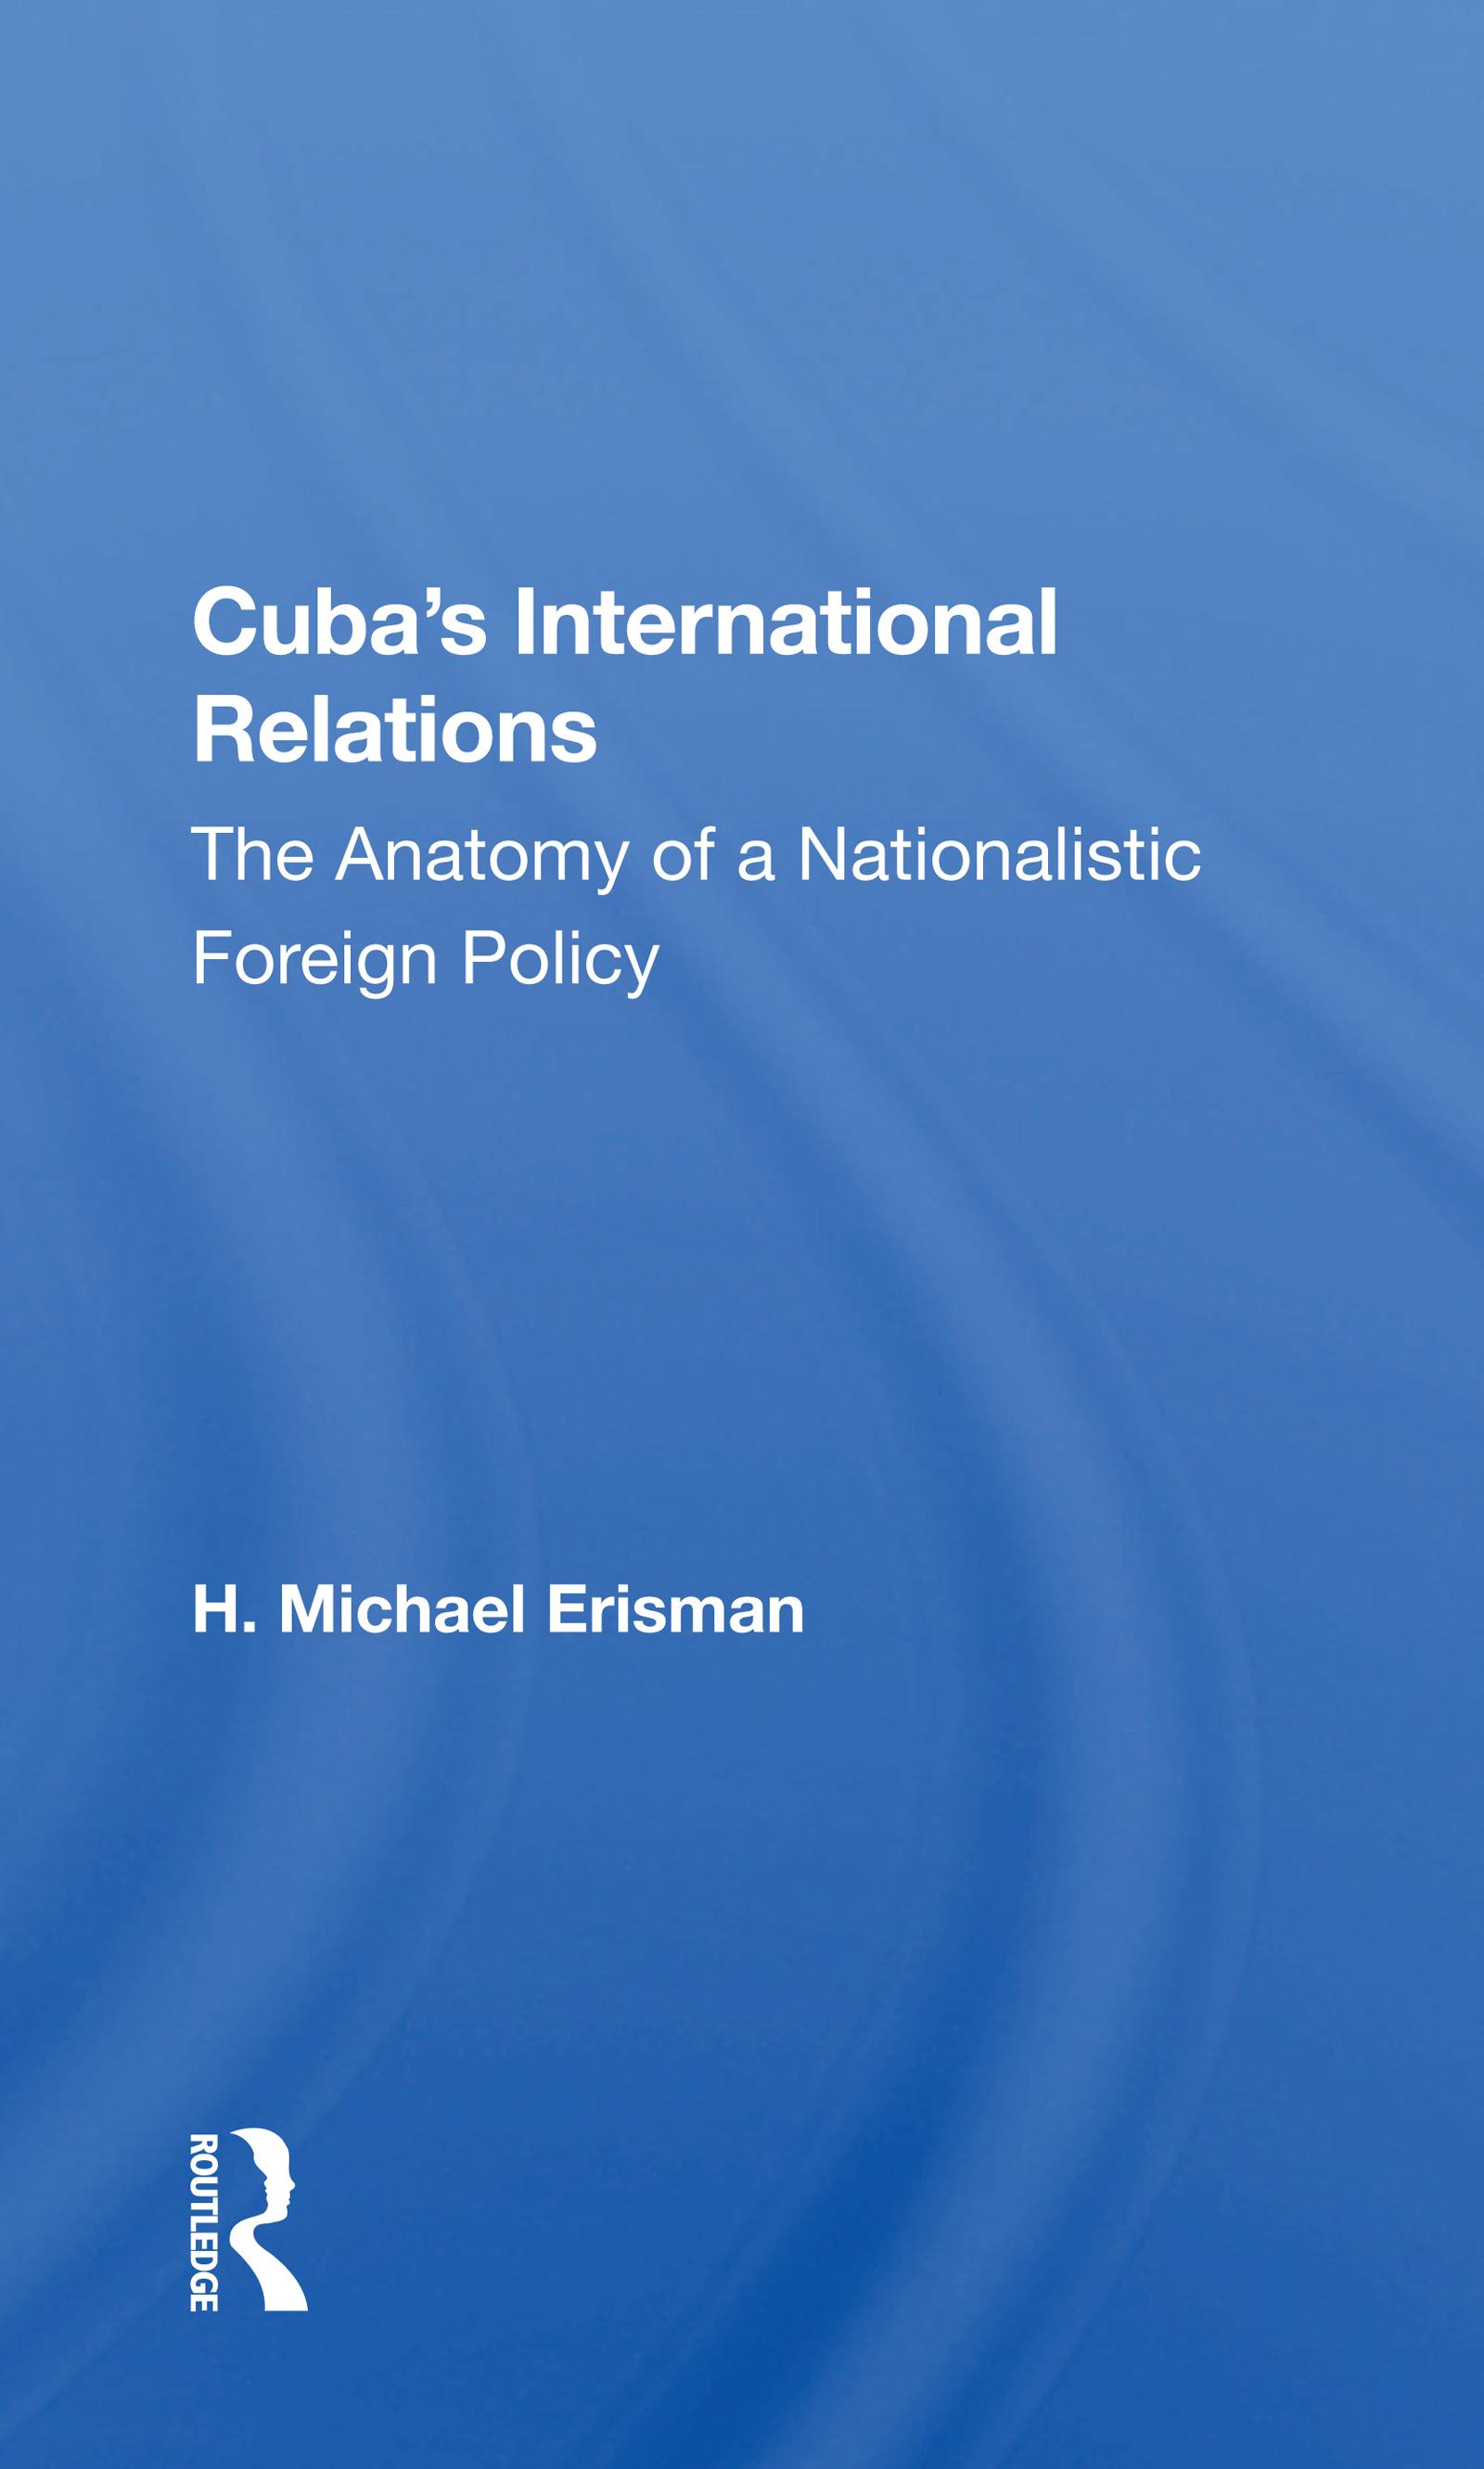 Cuba's International Relations